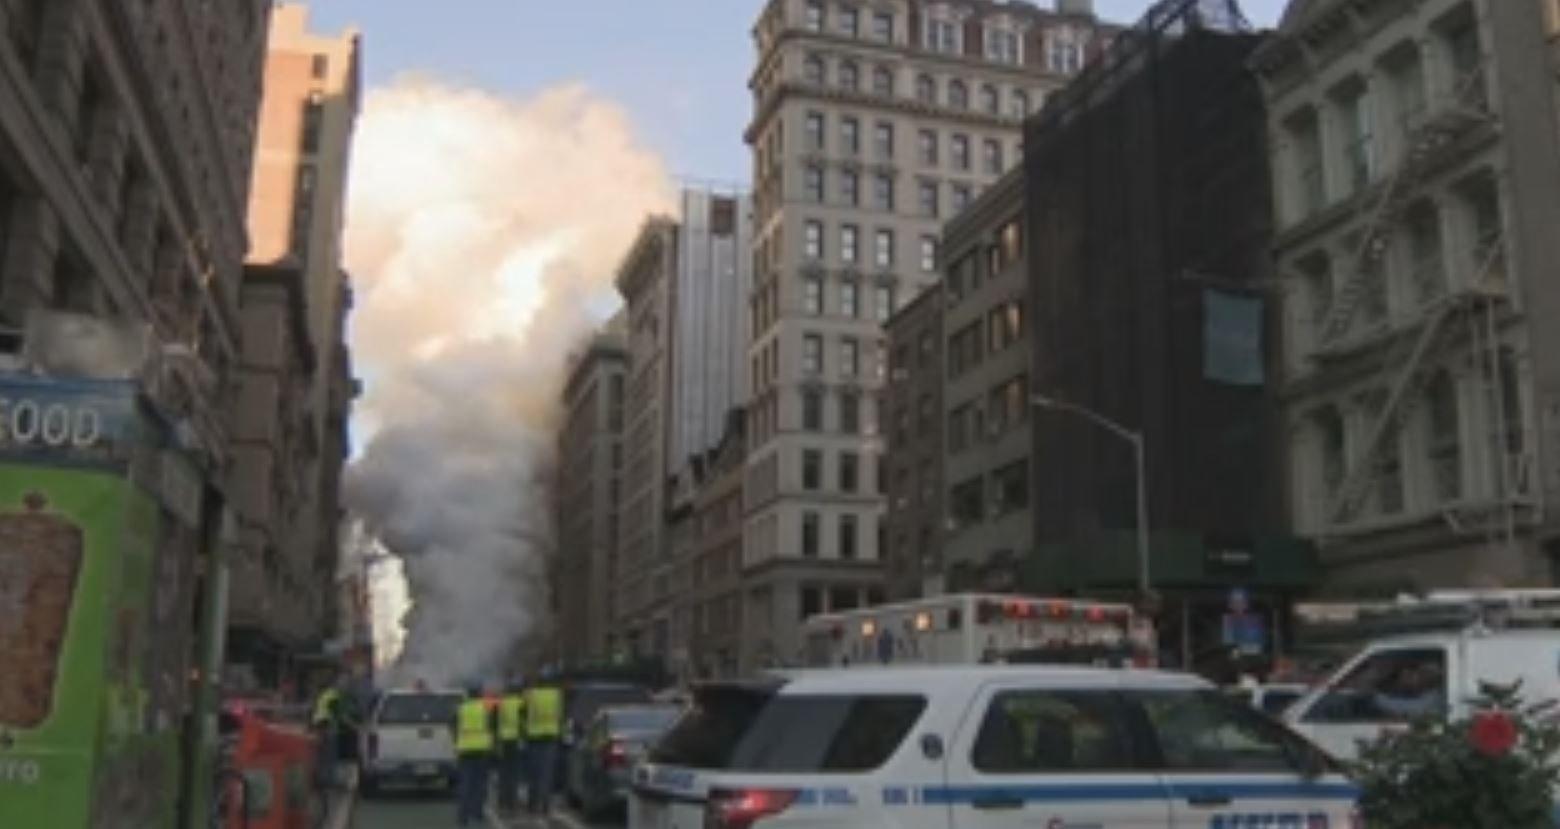 Photo: CBS New York